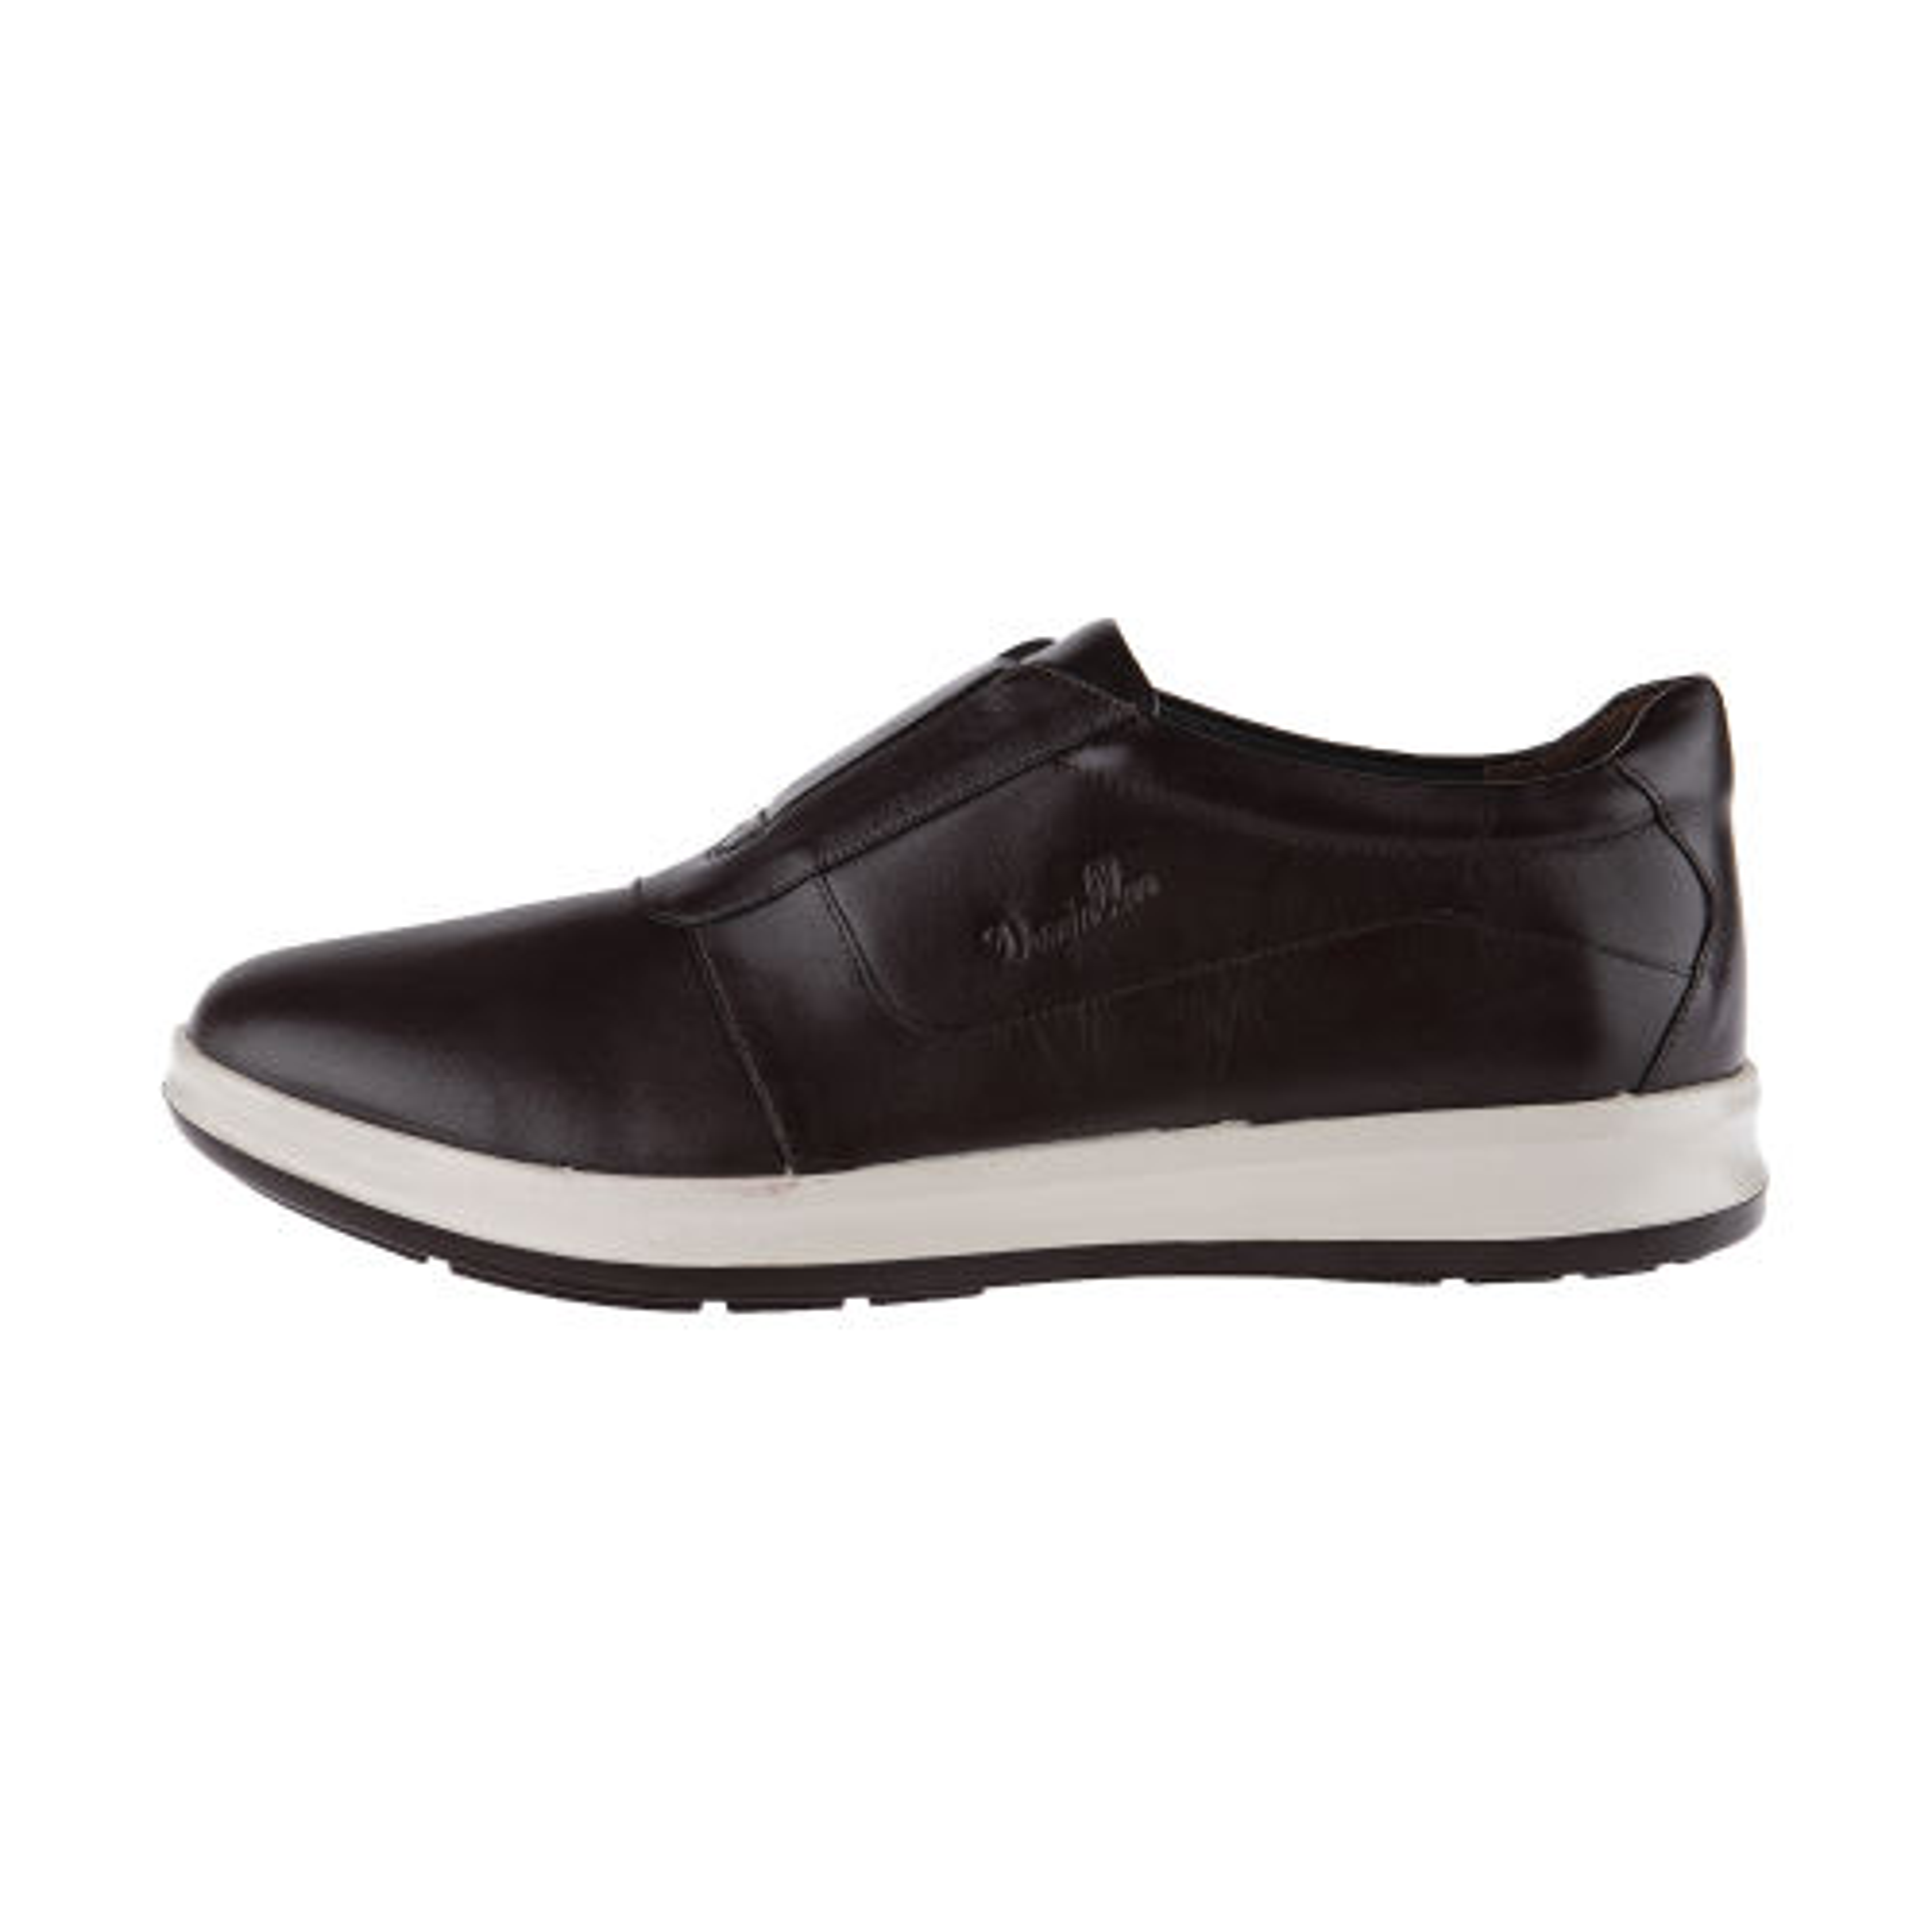 کفش مردانه دنیلی مدل 113110281371